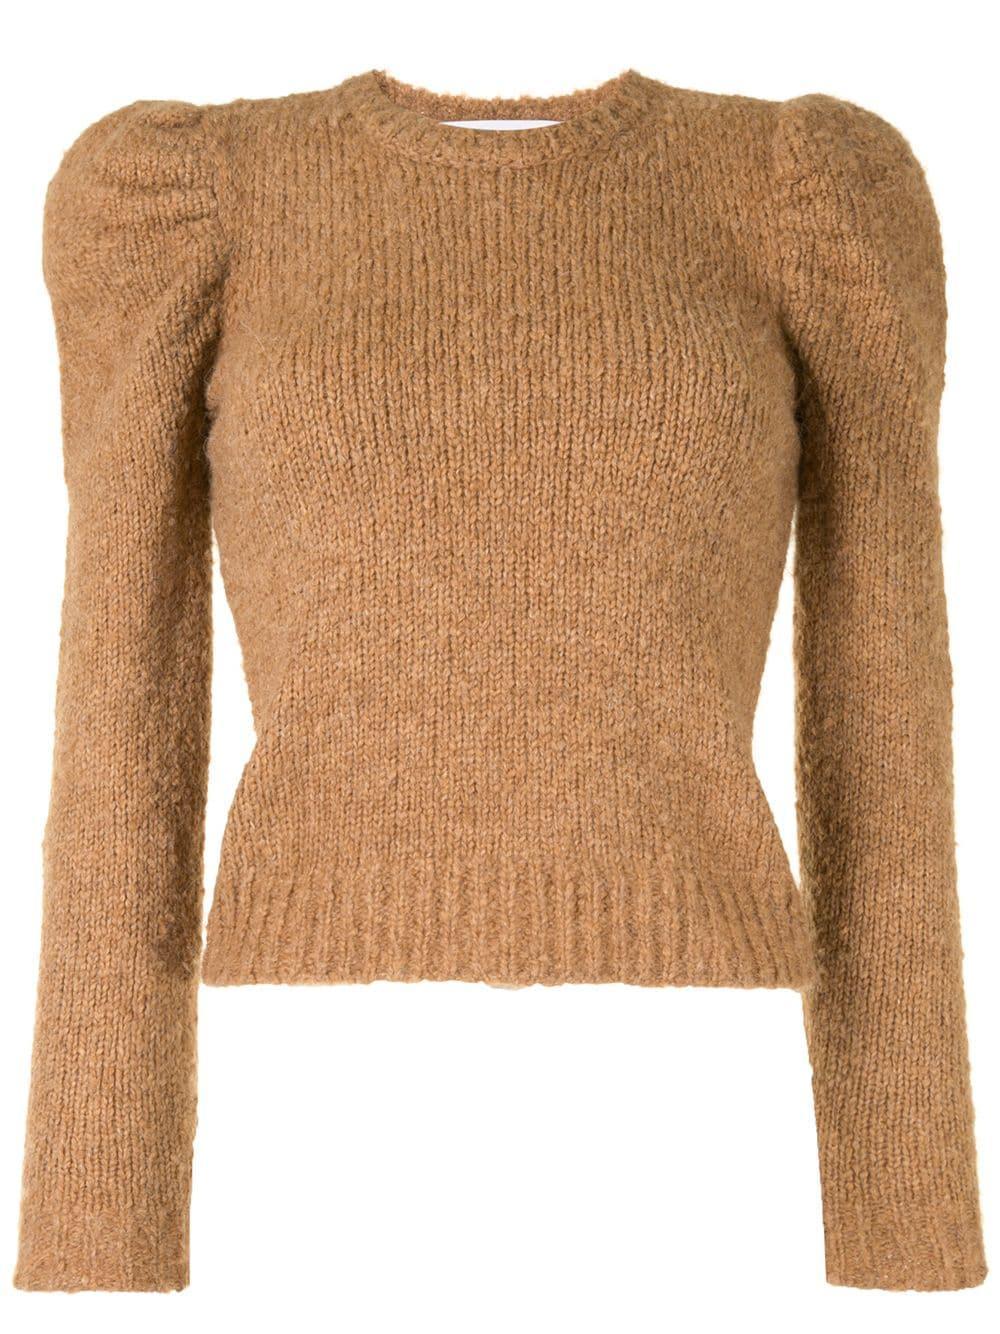 Locken Puff Sleeve Sweater